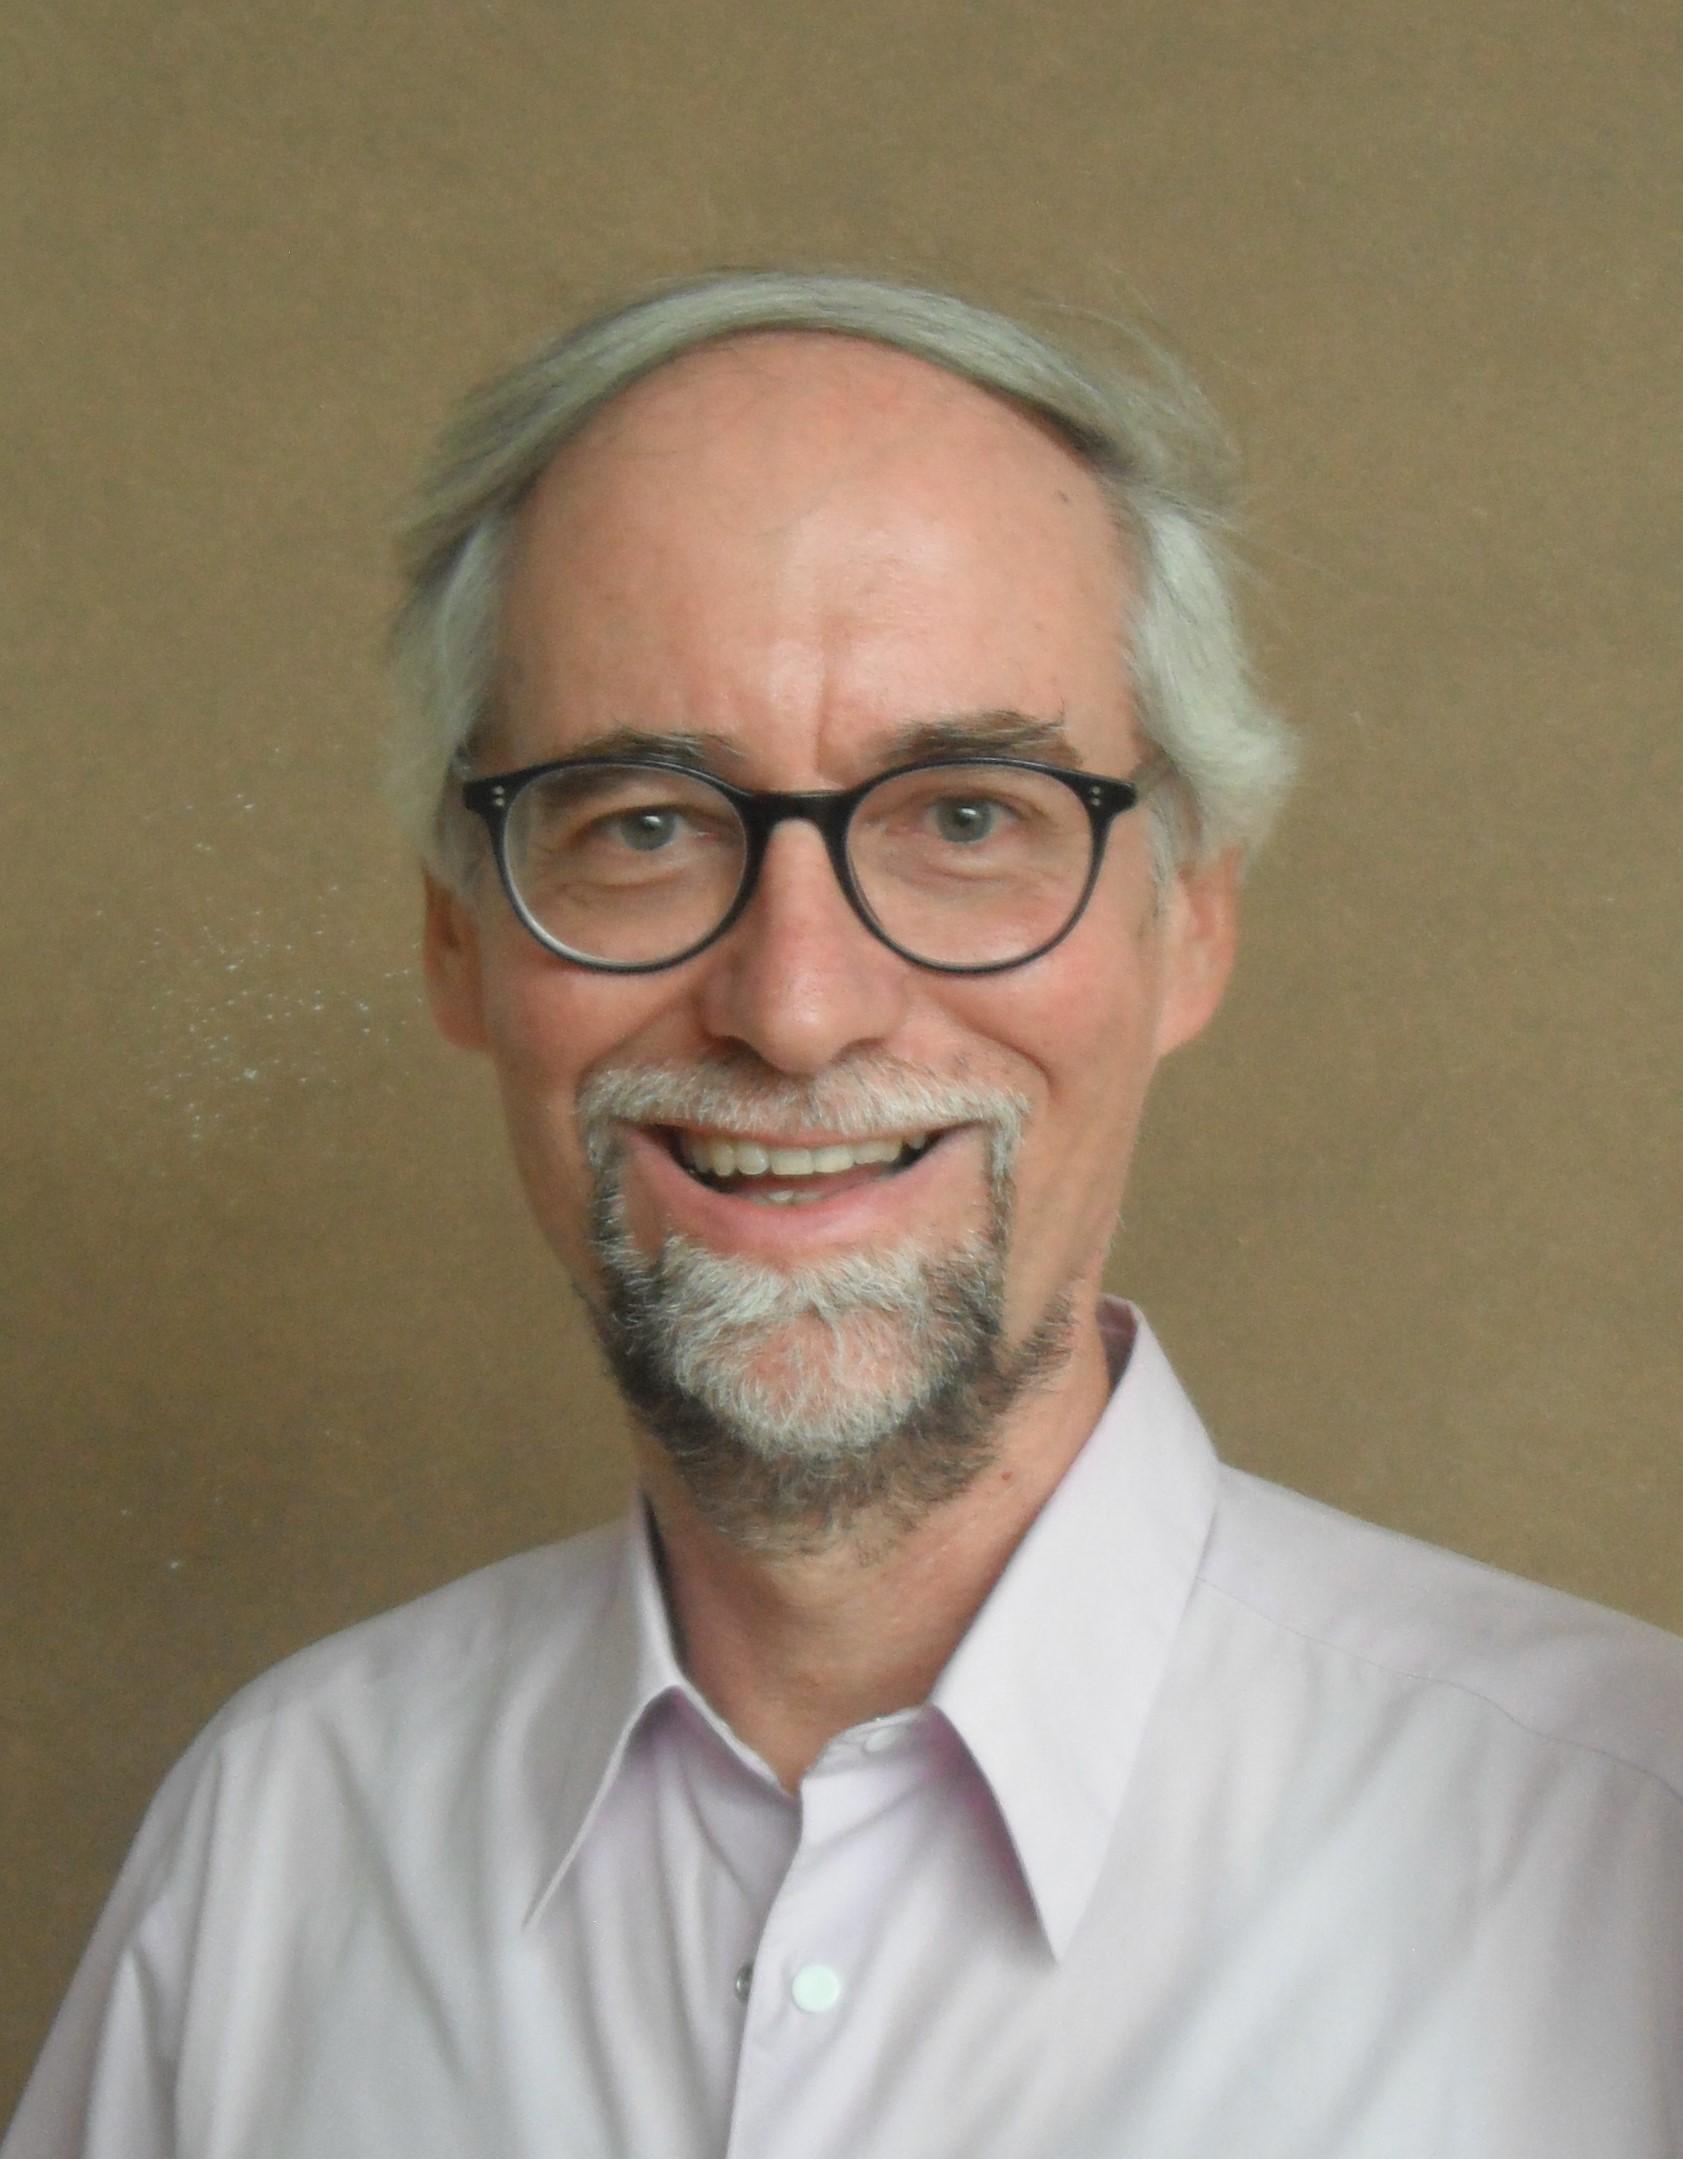 Portrait Gerhard M. Walch 29. 9. 19